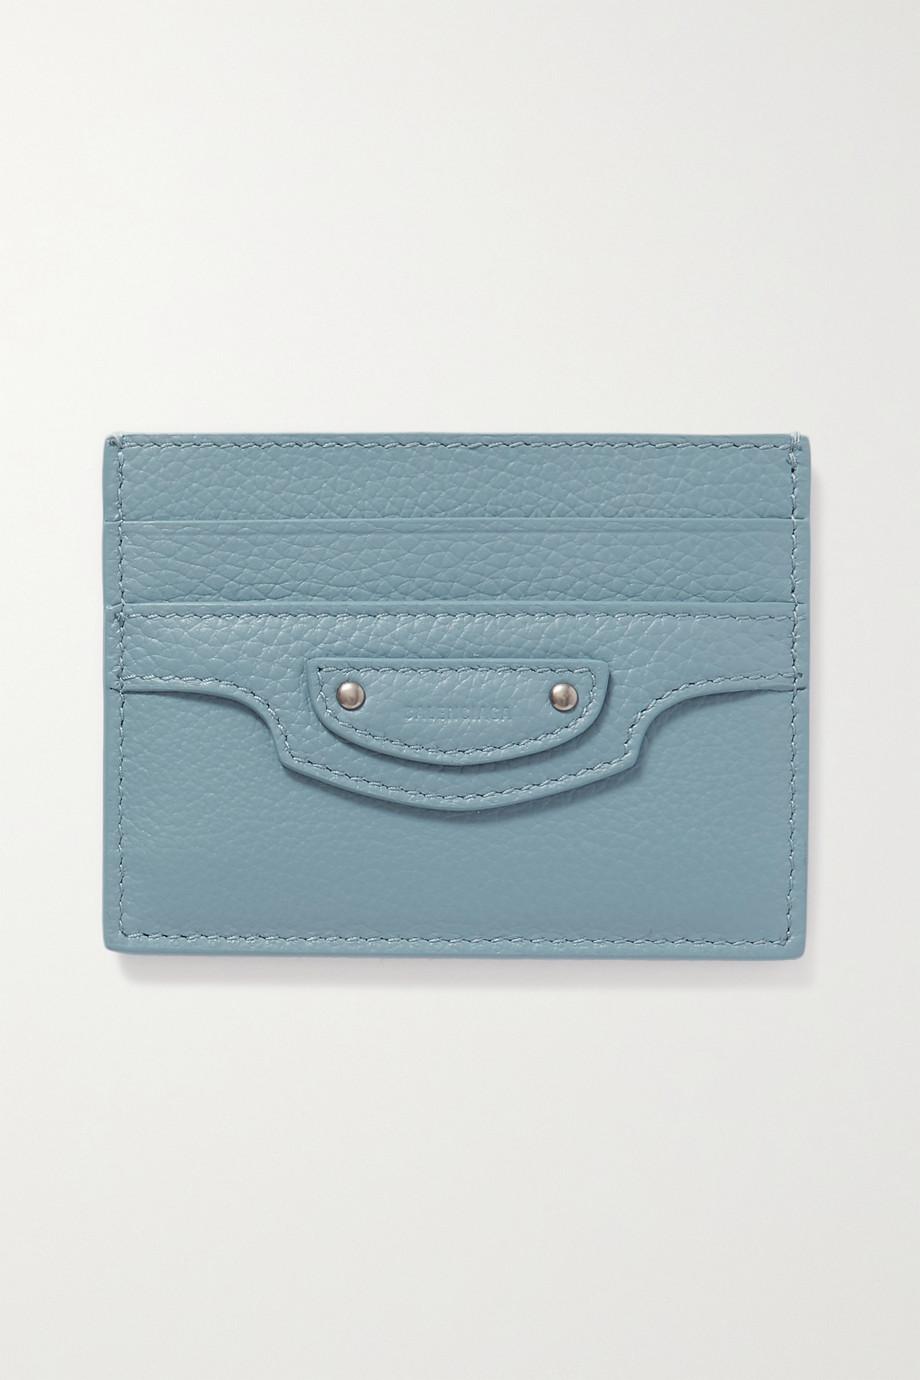 Balenciaga Neo Classic City textured-leather cardholder